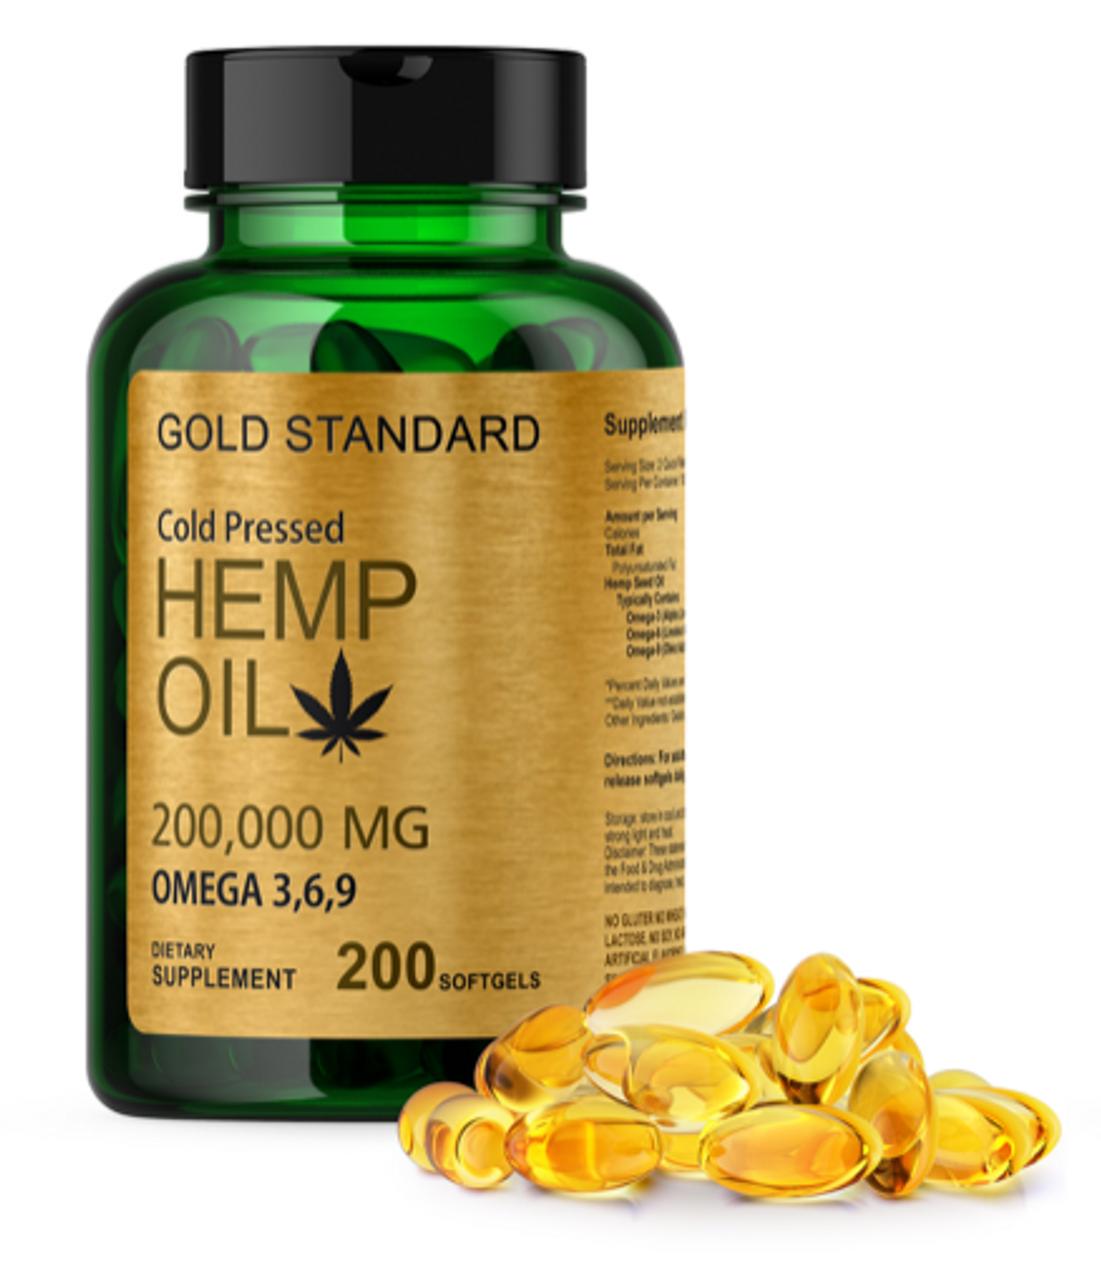 Cold Pressed Hemp Seed Oil Capsules 2000mg 200 Soft Gel Omega 3 6 9 Fatty Acids Nutrivitashop